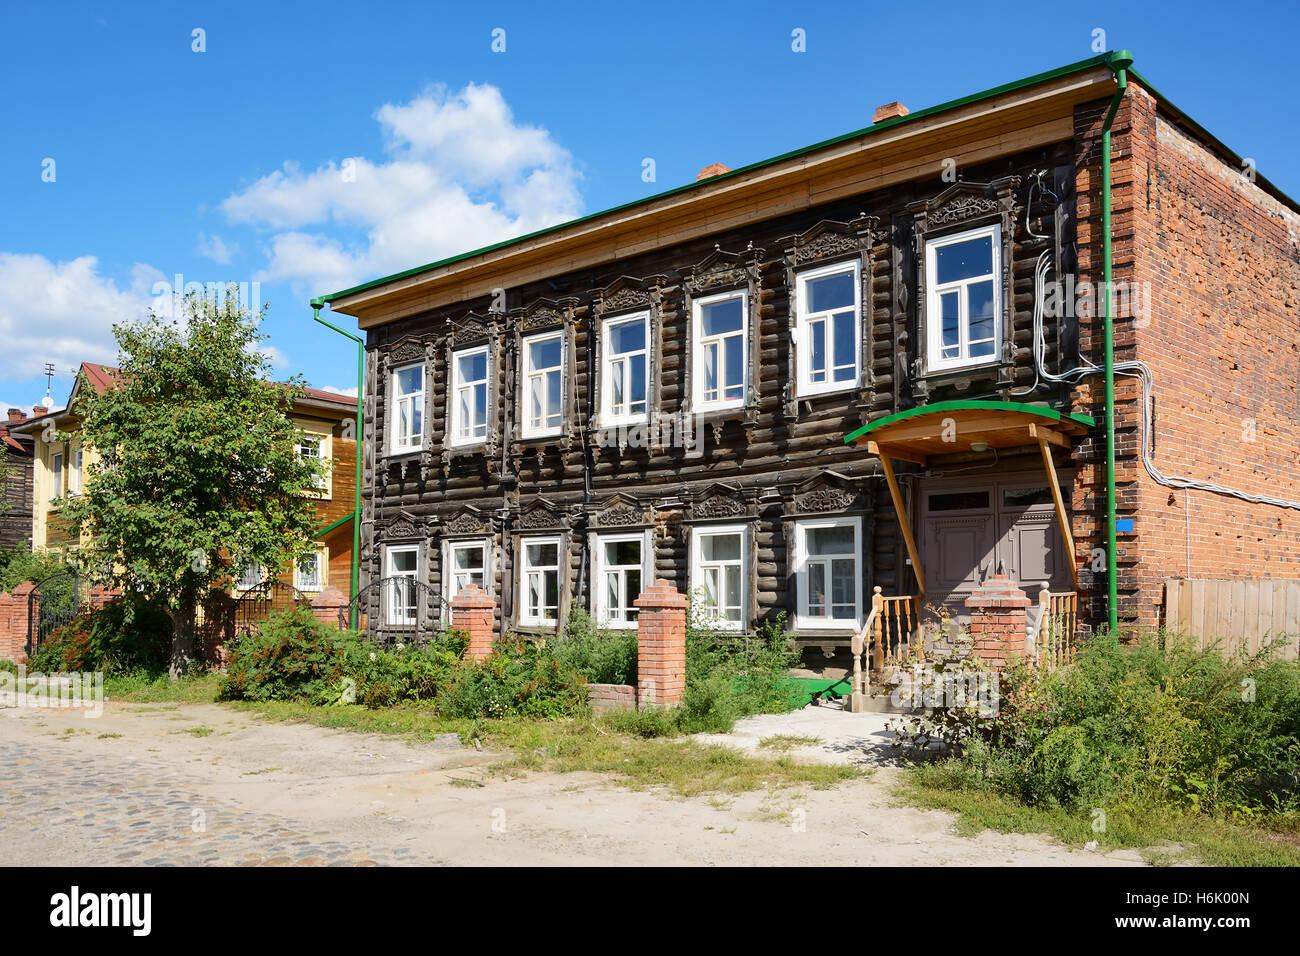 street wooden houses russia stockfotos street wooden houses russia bilder alamy. Black Bedroom Furniture Sets. Home Design Ideas